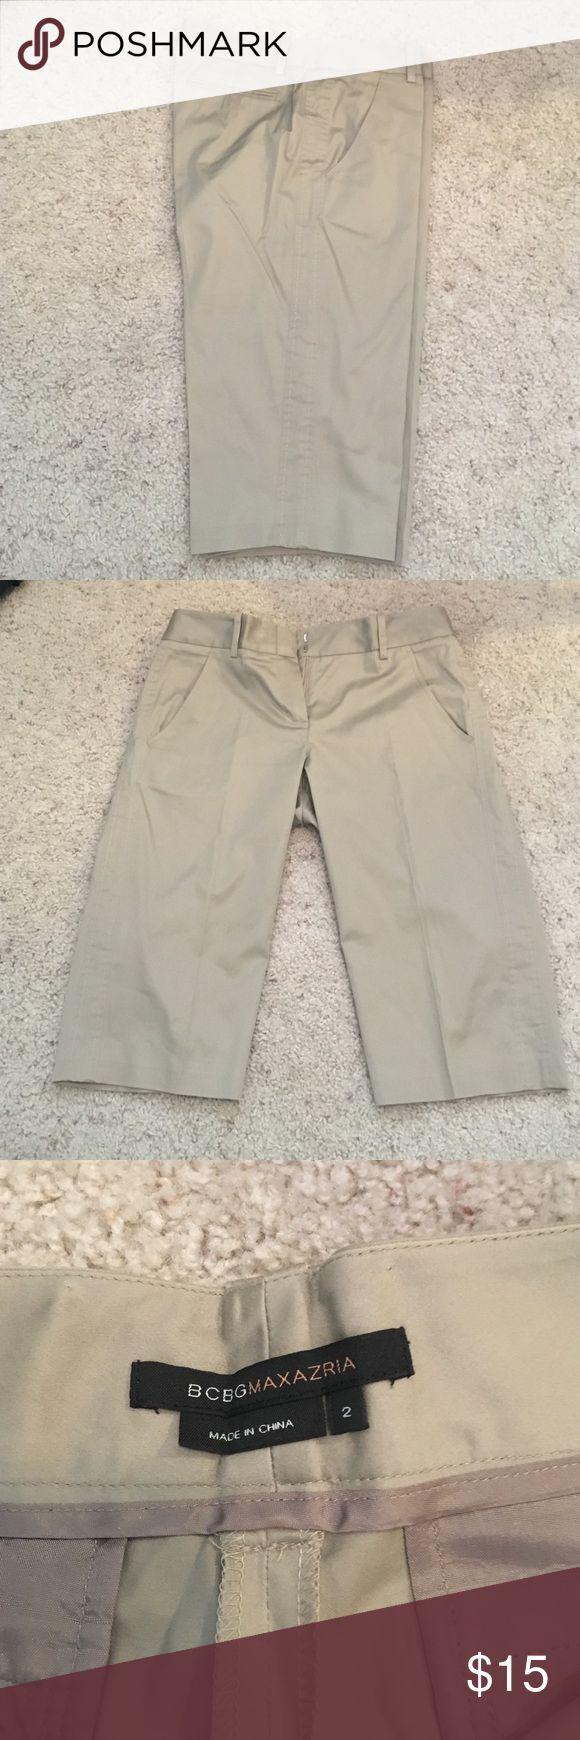 Cropped BCBG slacks Mud knee cropped khaki slacks by BCBG. Great for the office BCBGMaxAzria Pants Ankle & Cropped